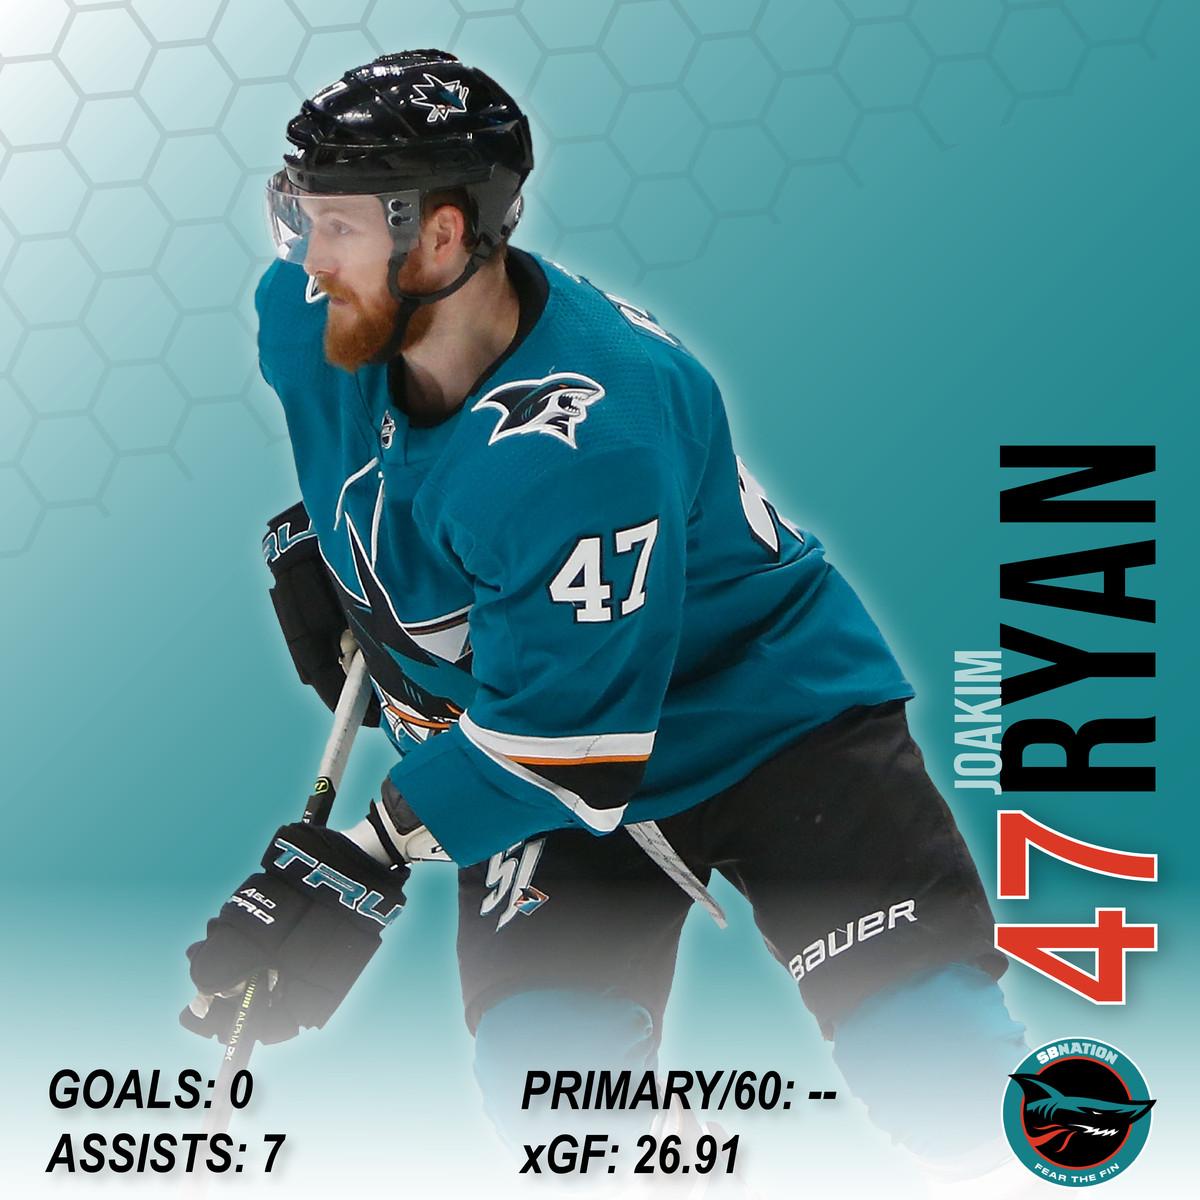 Joakim Ryan player card